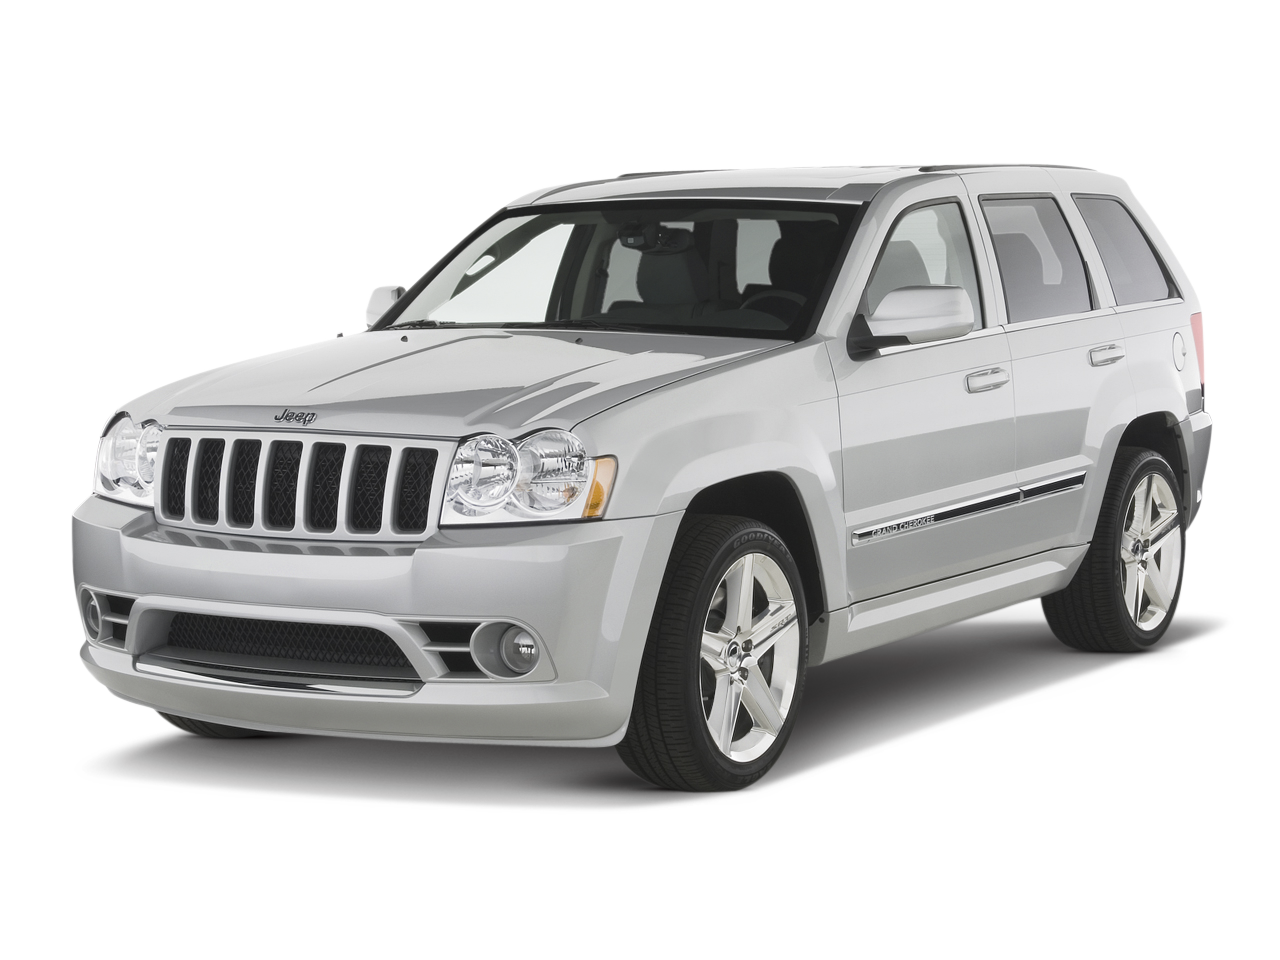 2007 Jeep Grand Cherokee 4WD